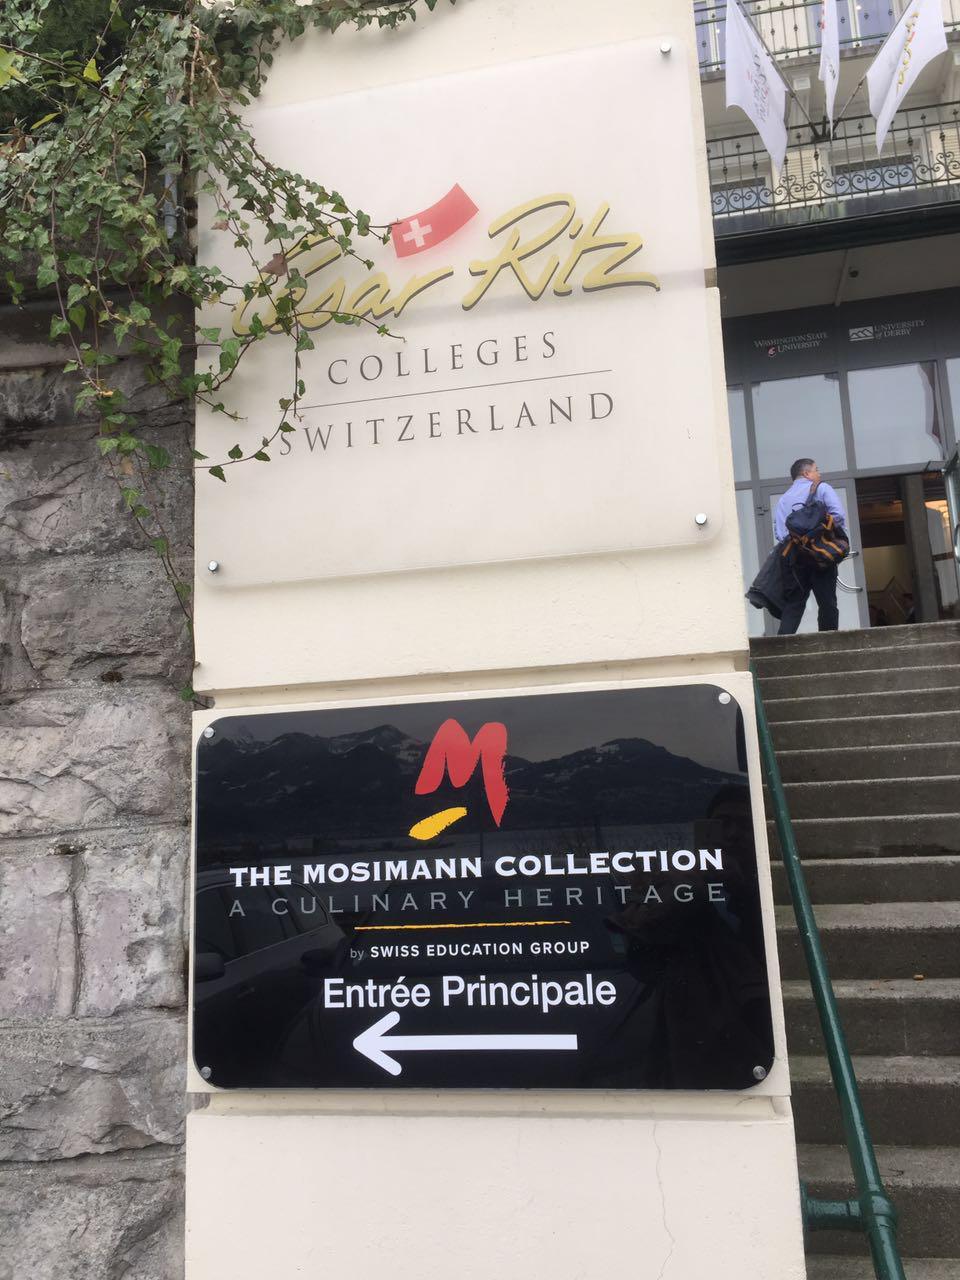 CR恺撒里兹酒店管理大学